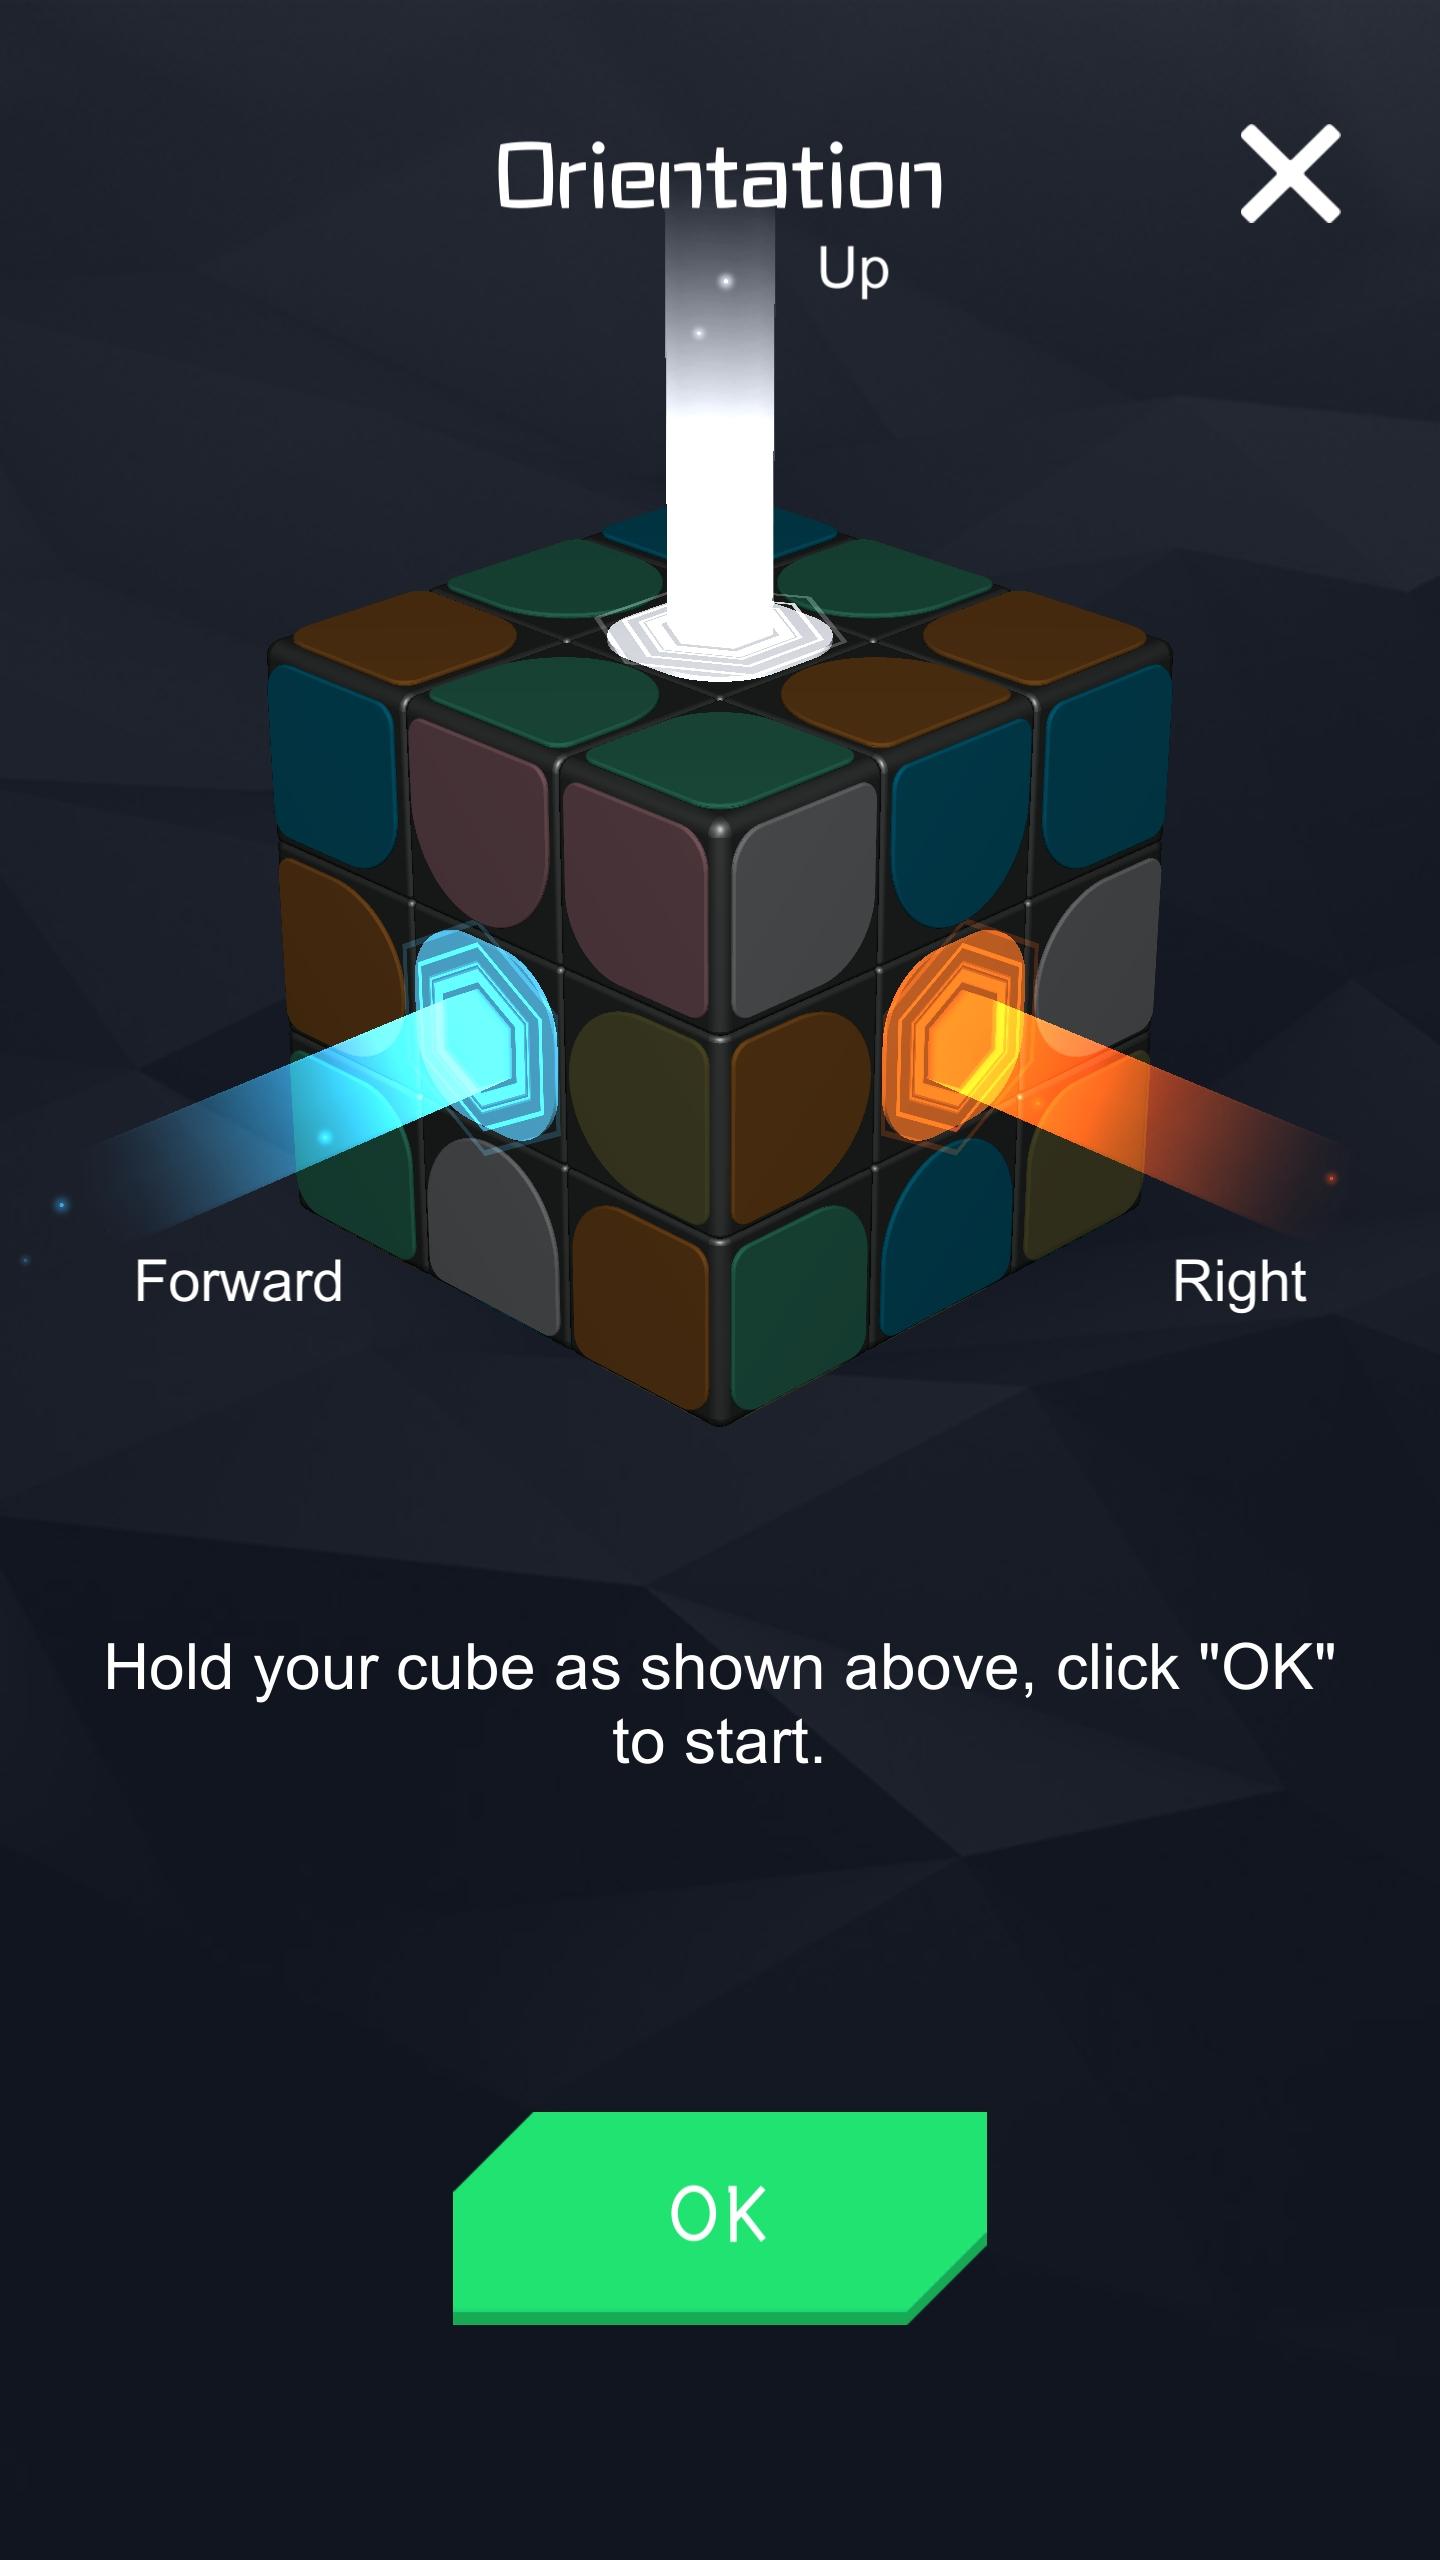 xiaomi-rubik-kocka-giiker-geeker-okoskocka-varazskocka-magic-cube-teszt-07